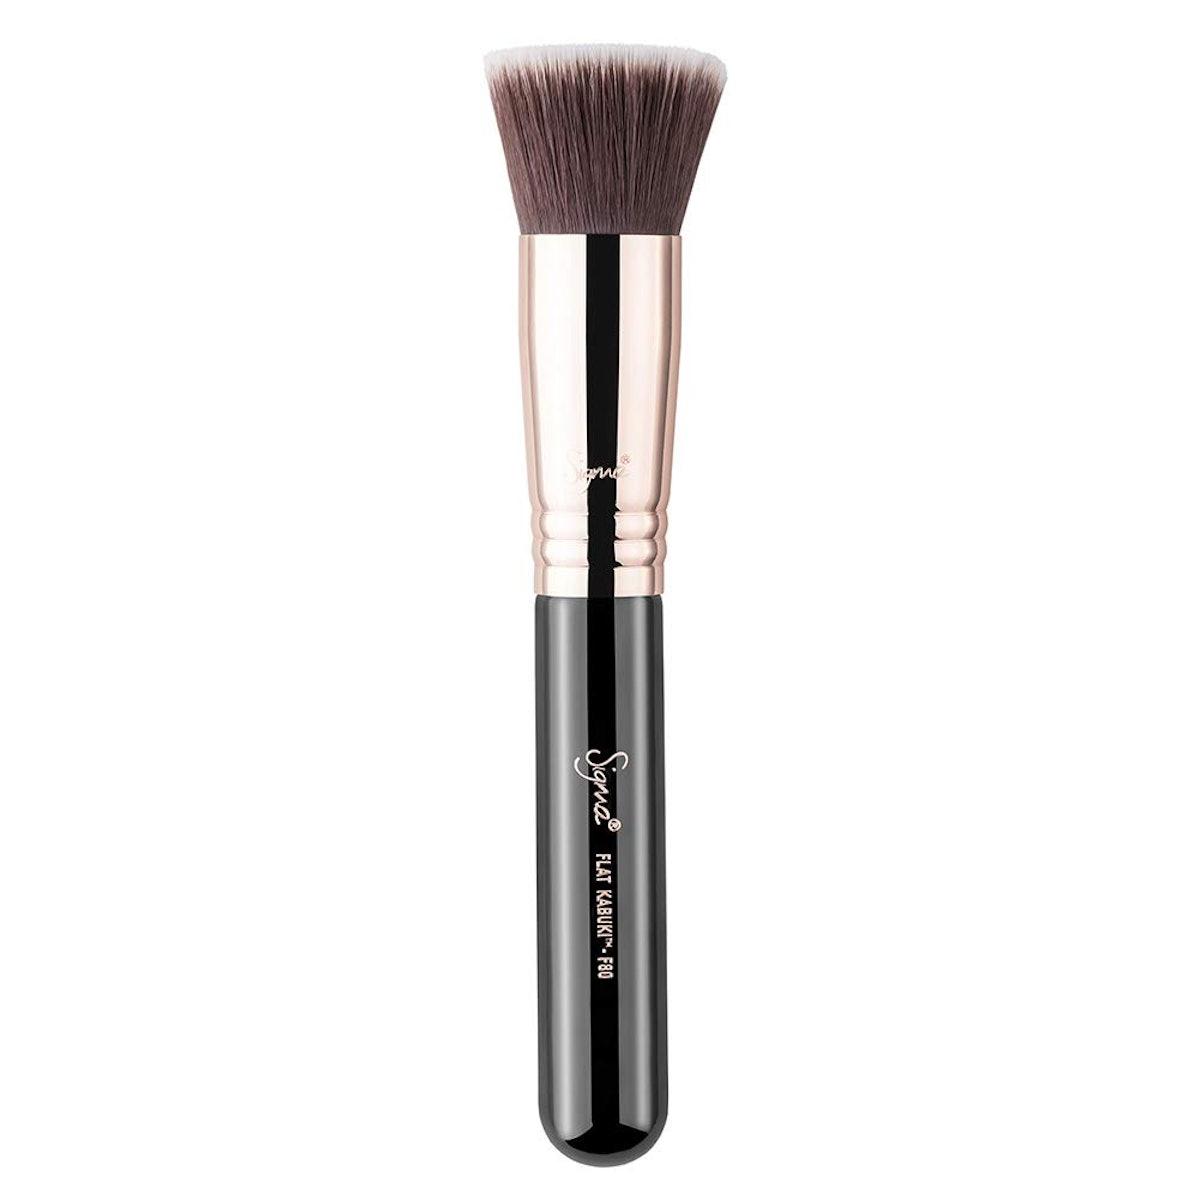 Sigma Beauty Flat Kabuki Makeup Brush F80